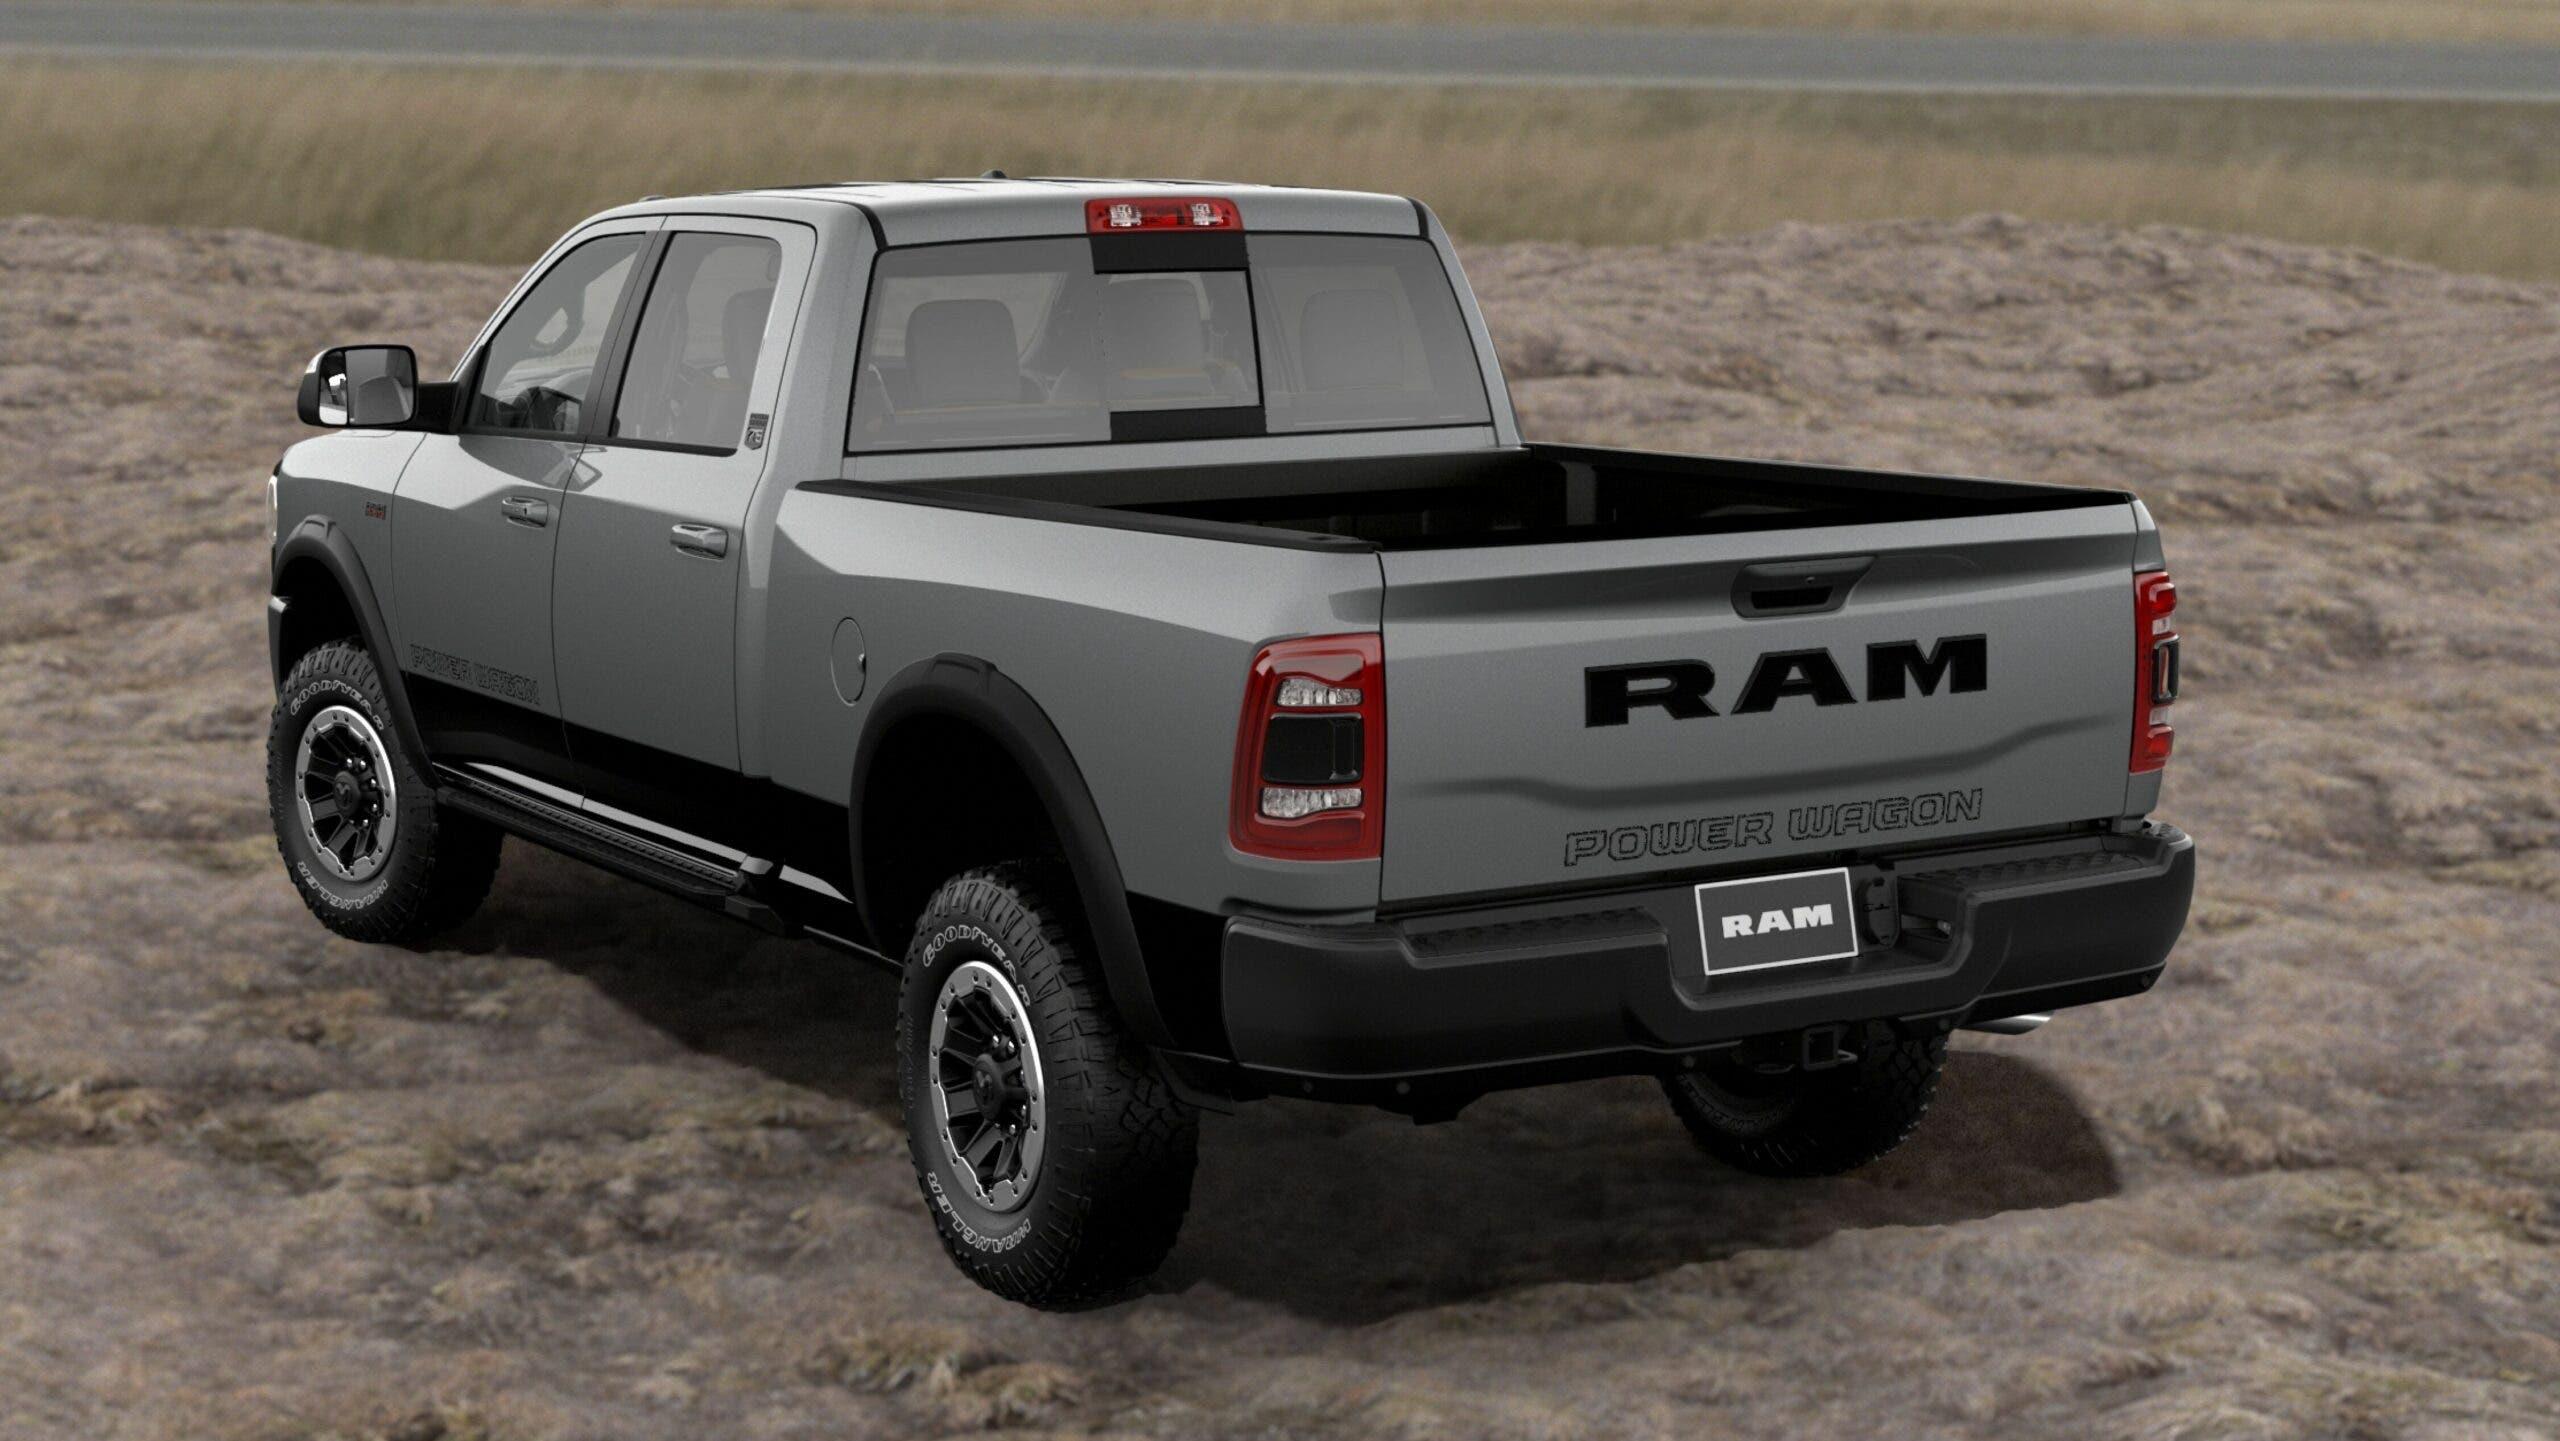 Ram 2500 Power Wagon 75th Anniversary Edition